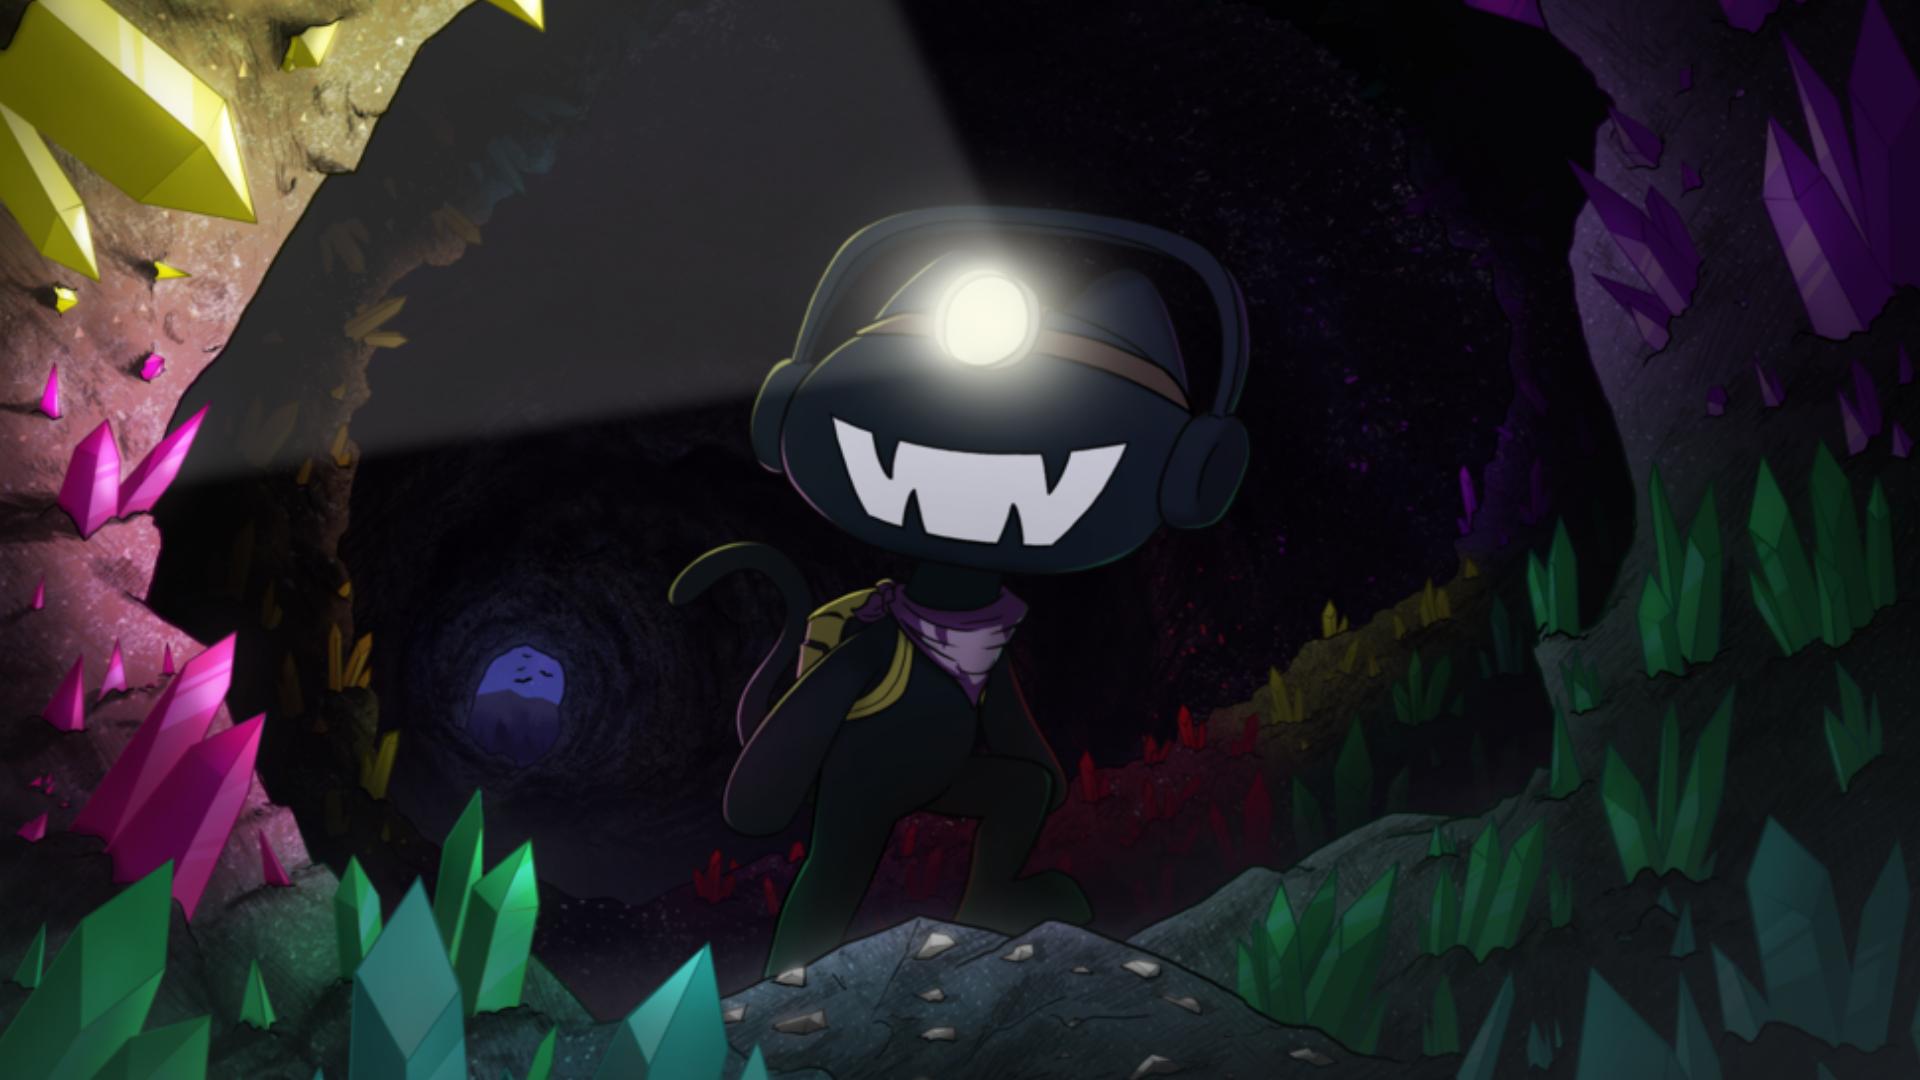 24 Monstercat HD Wallpapers | Backgrounds - Wallpaper Abyss